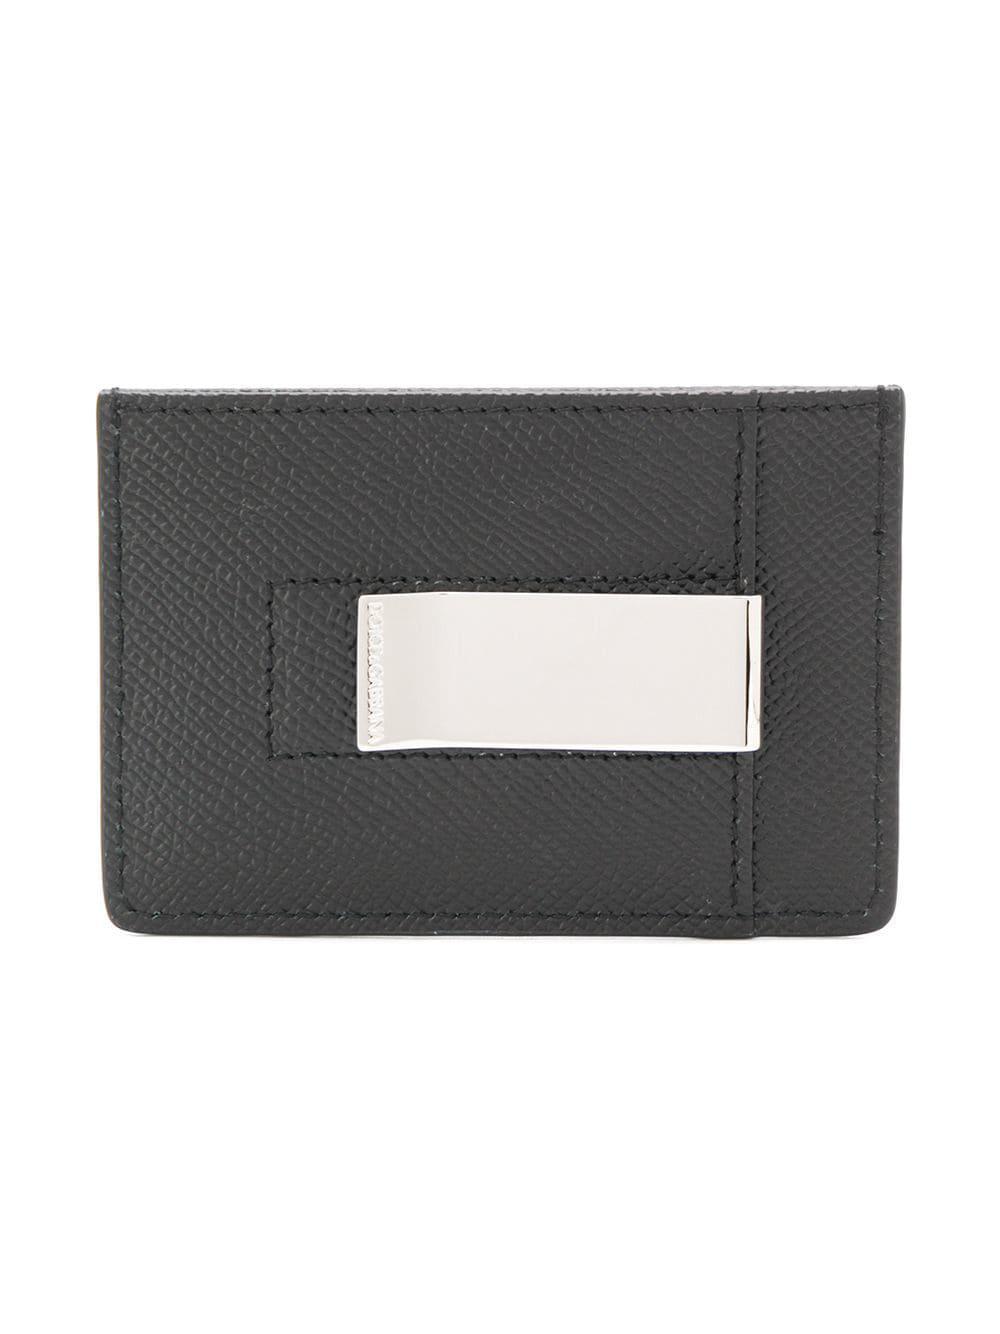 1d4ee26b8c Lyst - Dolce & Gabbana Piggy Wallet in Black for Men